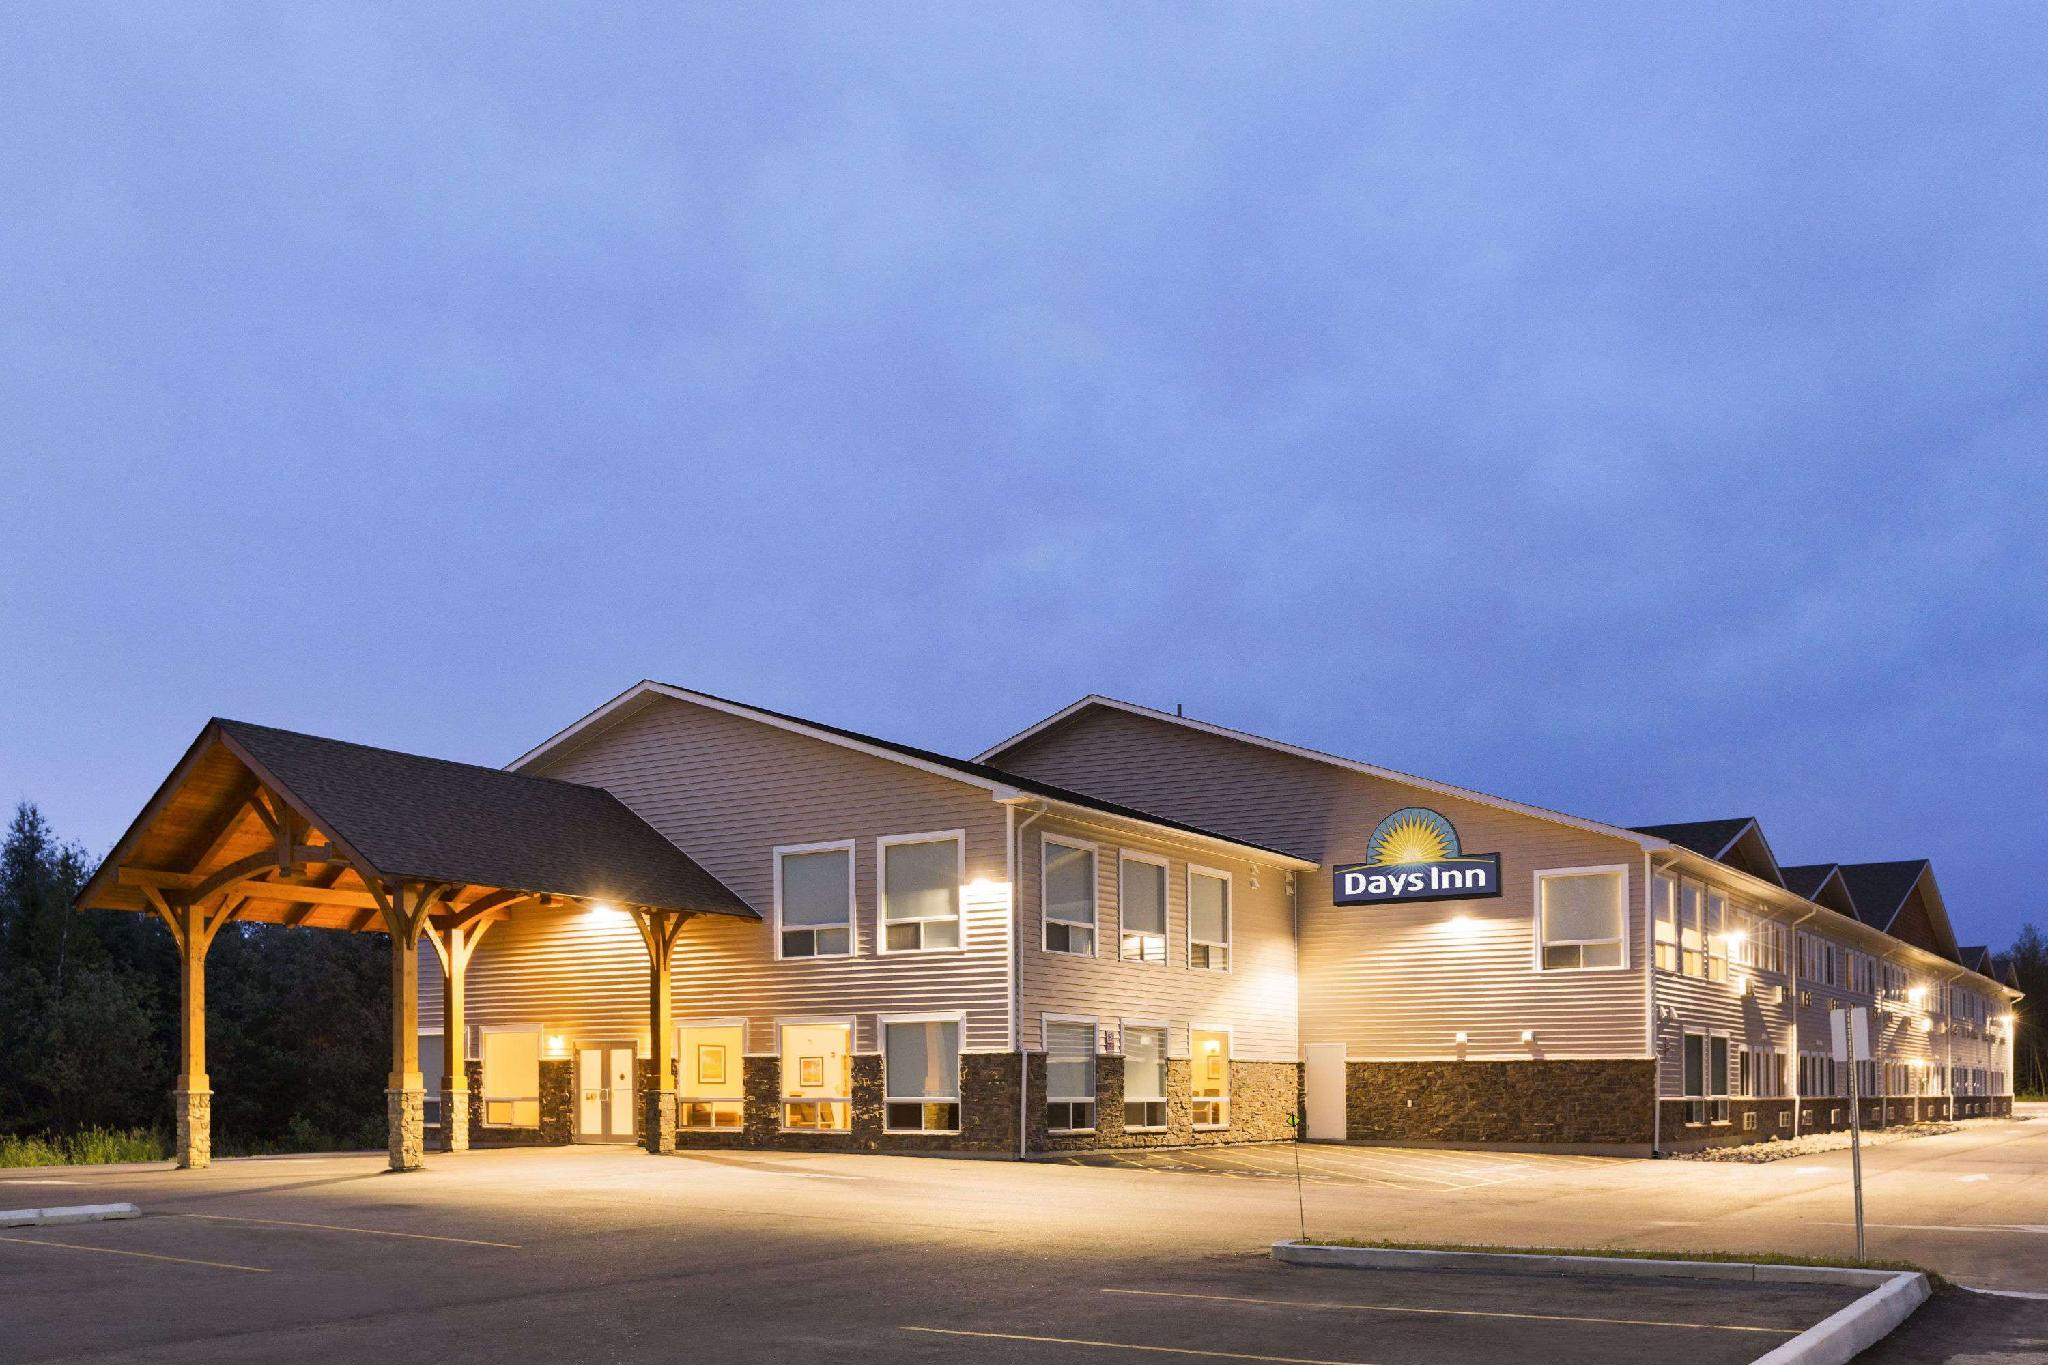 Days Inn By Wyndham Sioux Lookout